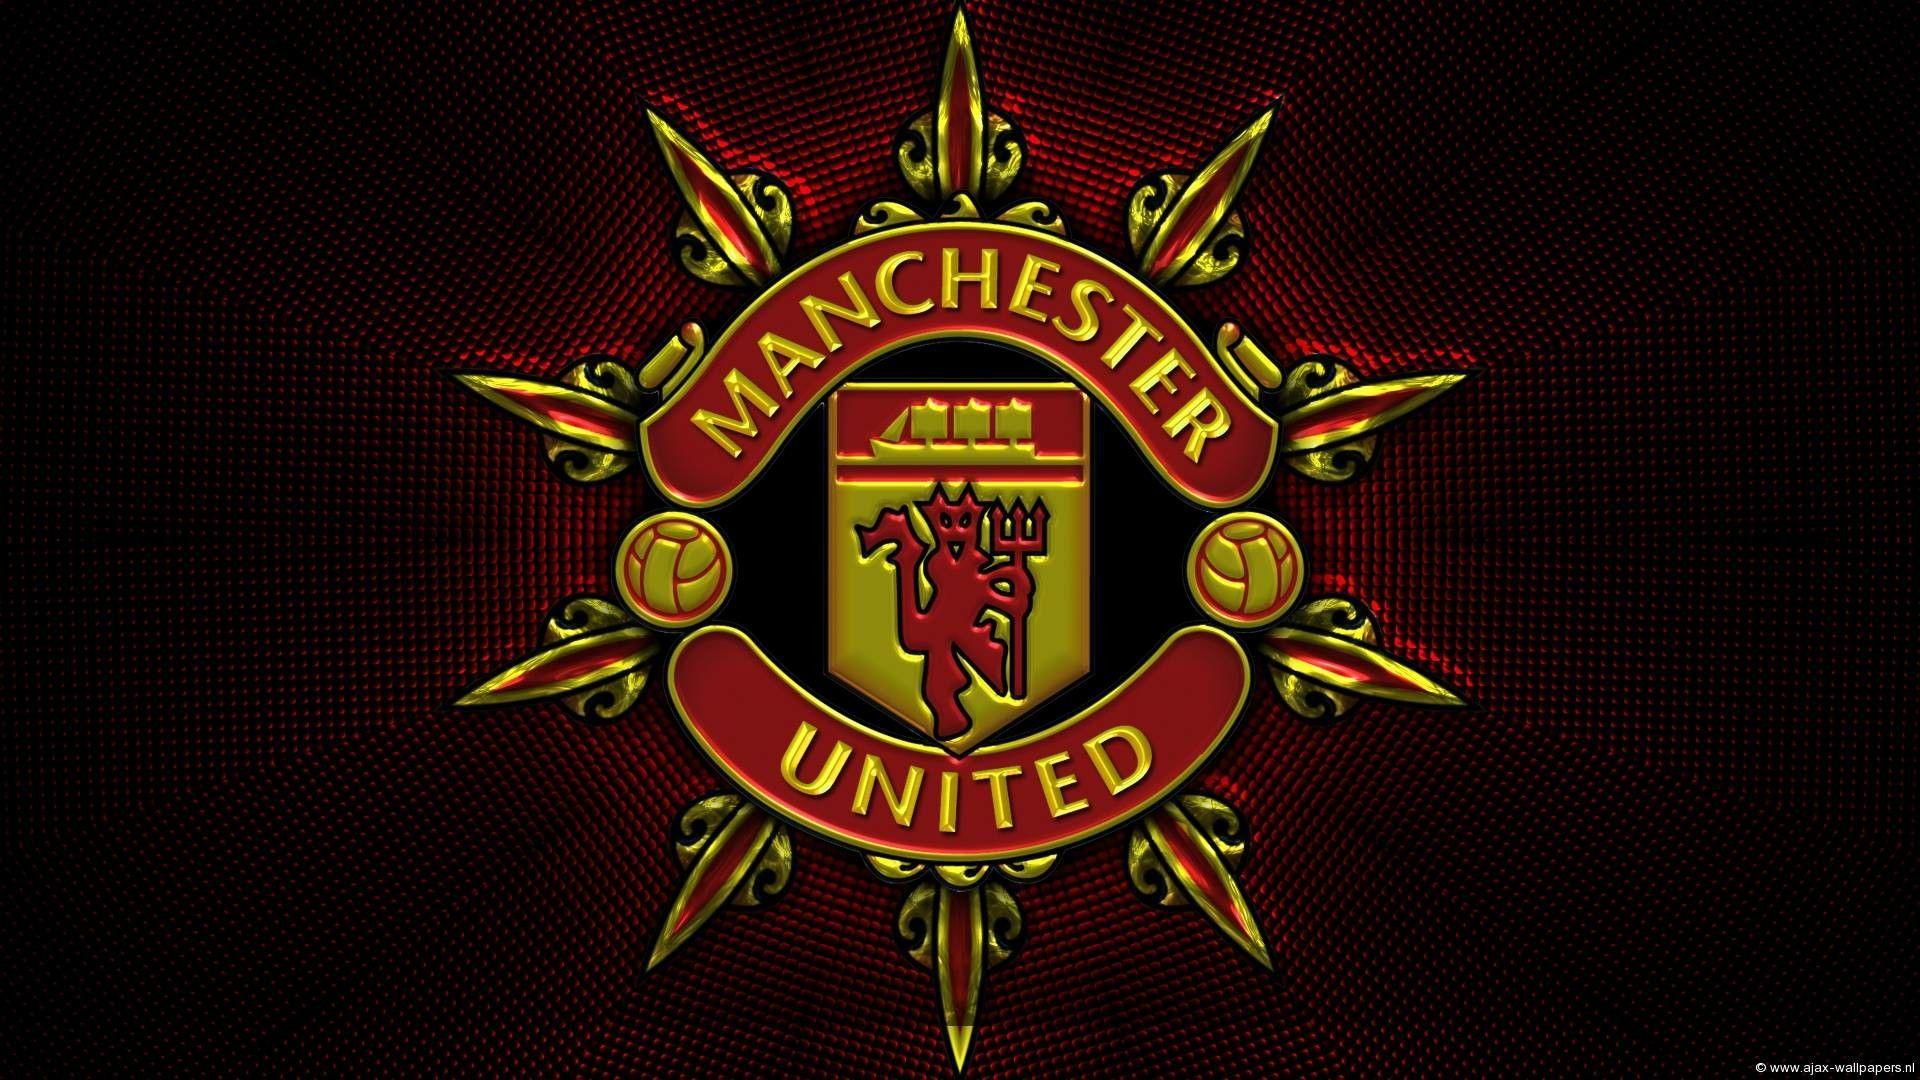 Manchester United Macbook Wallpaper Hd Football In 2020 Manchester United Wallpaper Manchester United Logo Manchester United